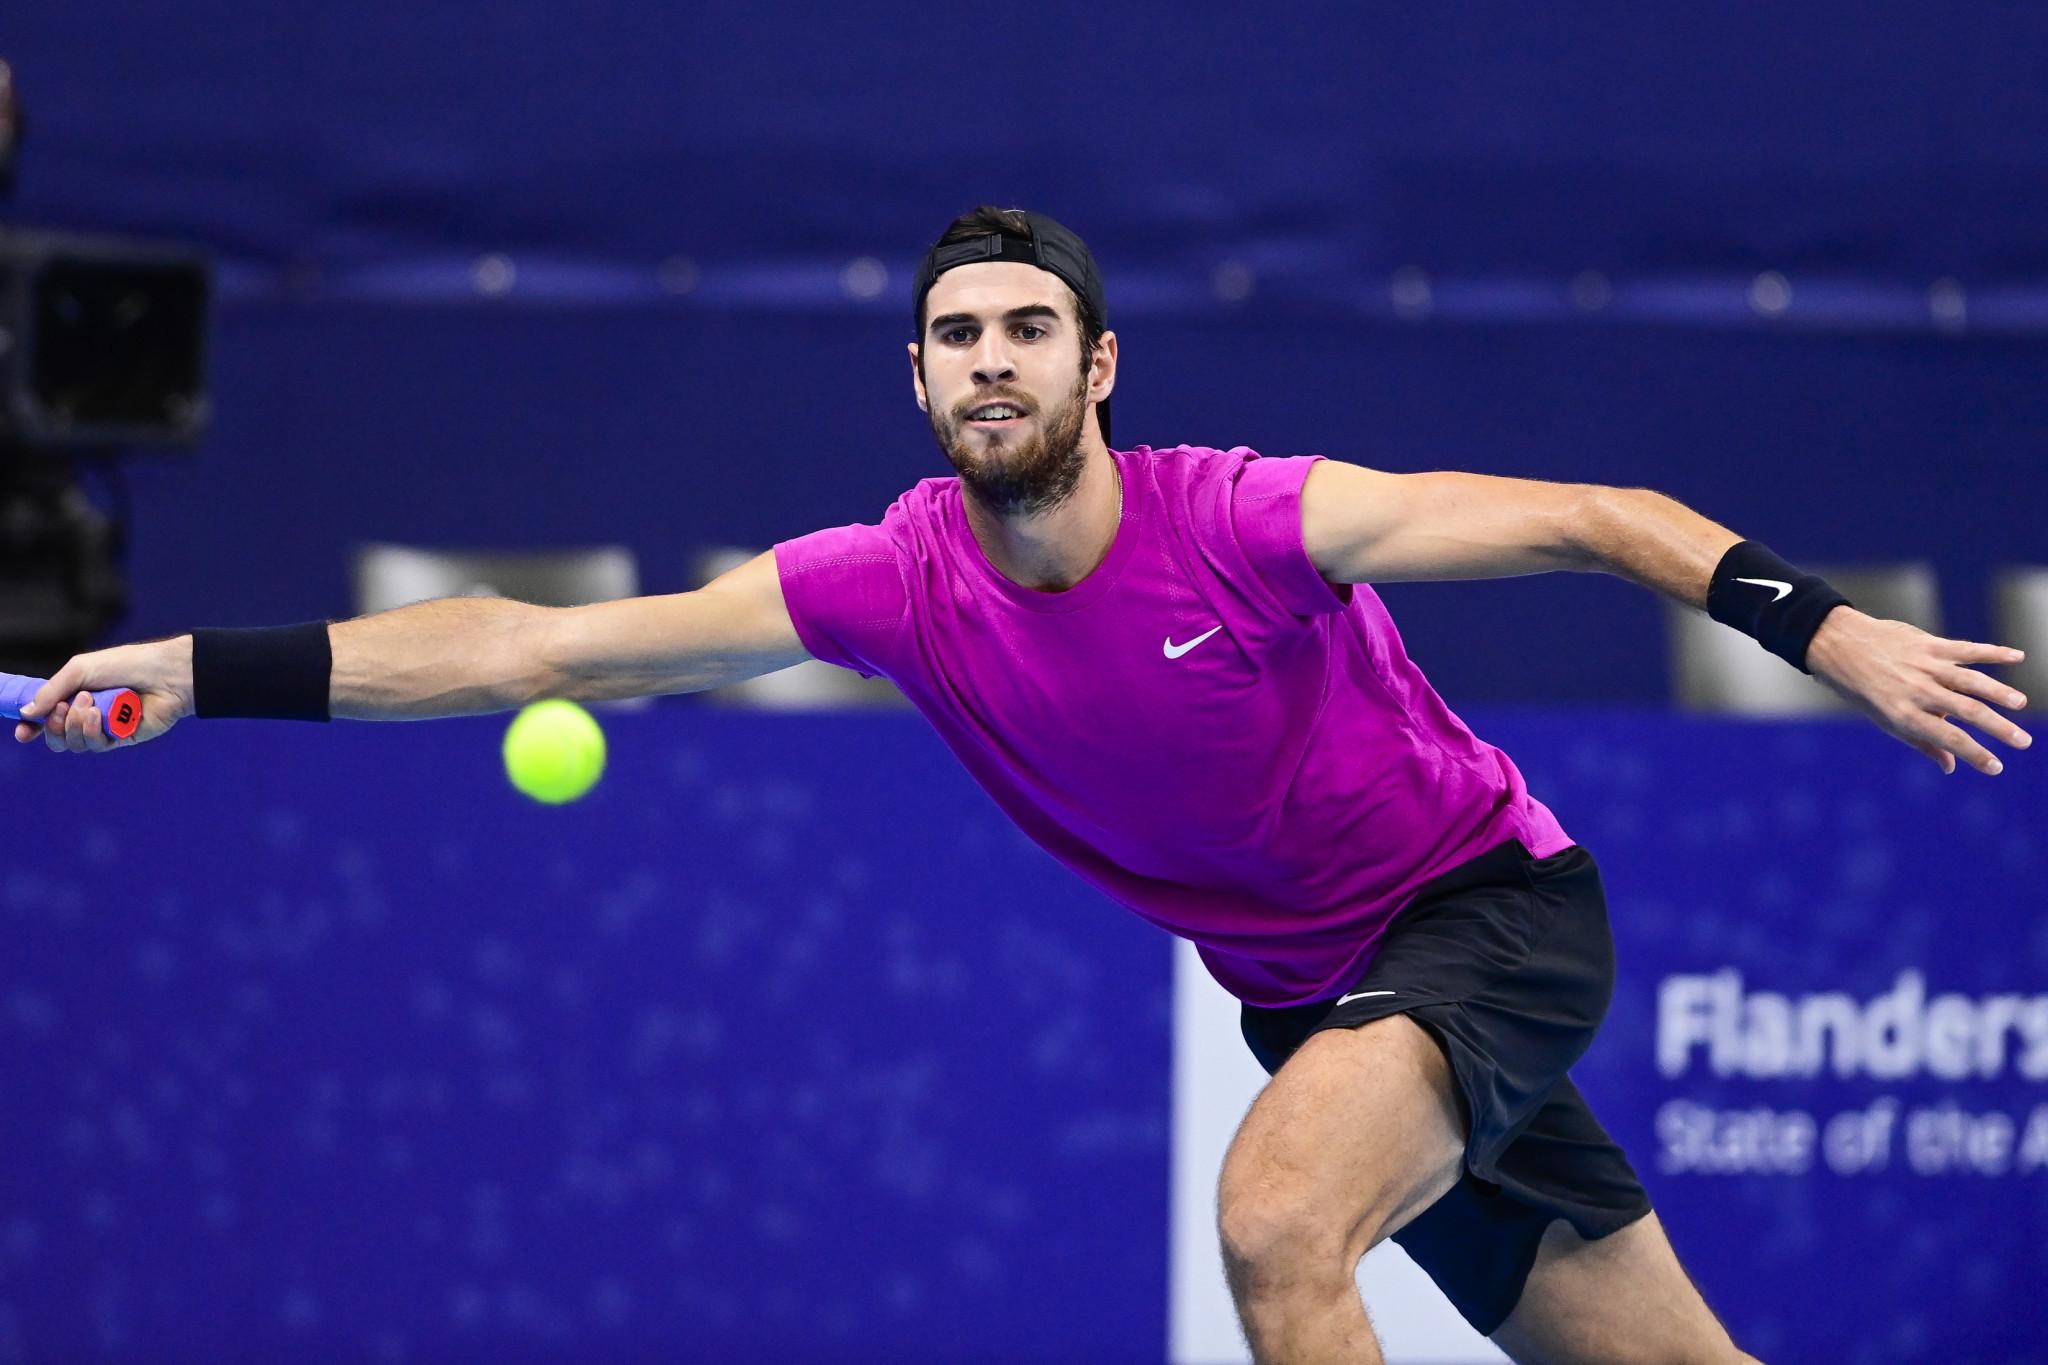 Russian tennis player Khachanov tests positive for coronavirus